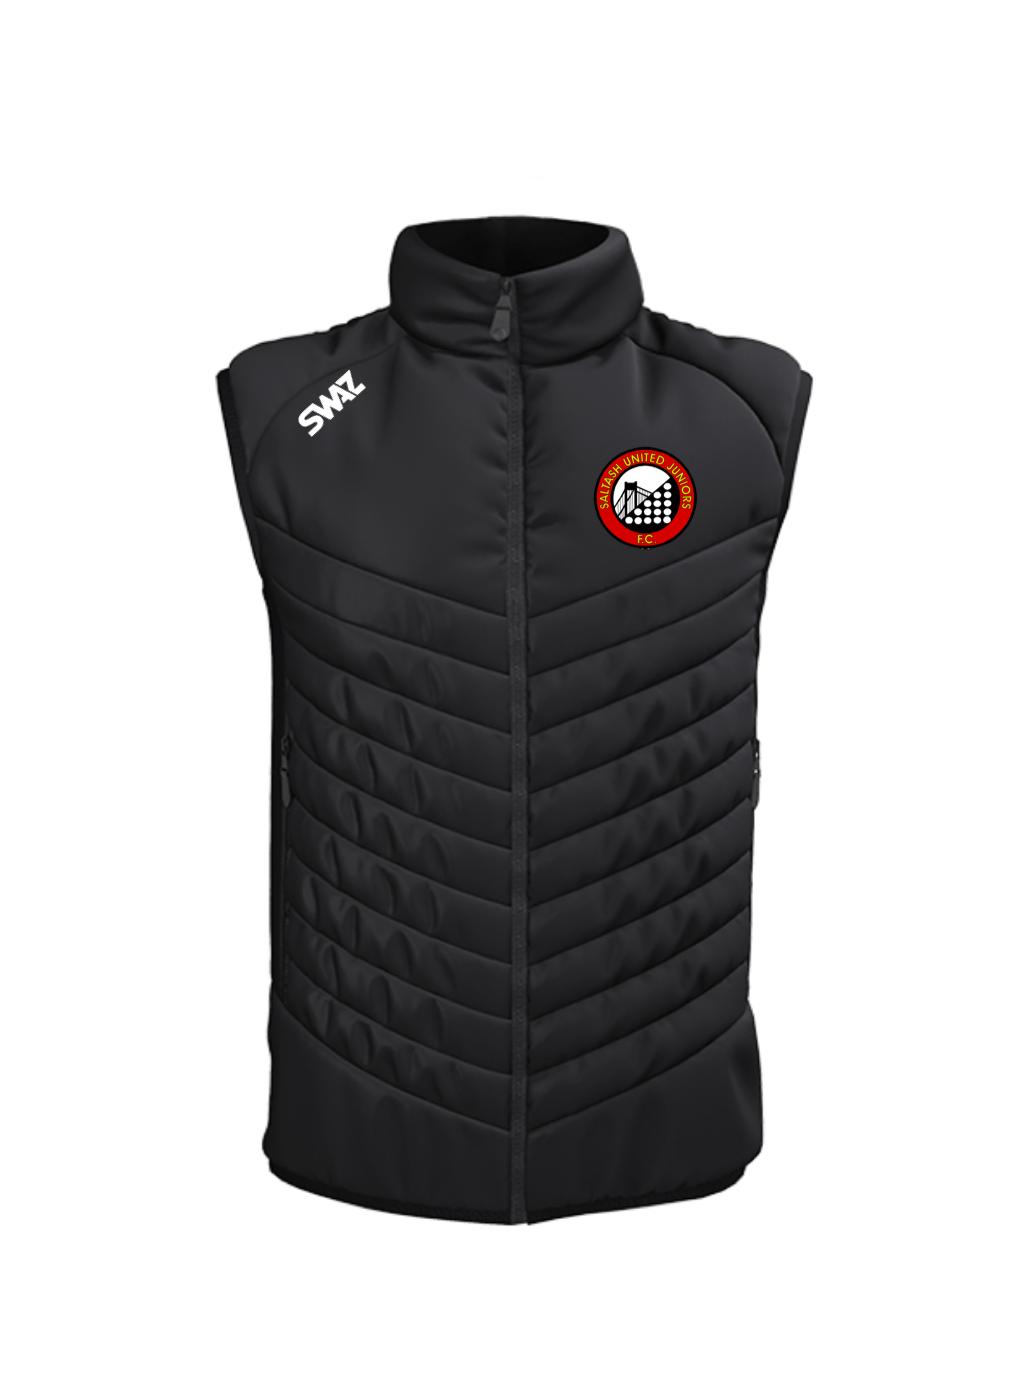 Saltash United Juniors Gilet   SWAZ Teamwear   Football Kit Supplier